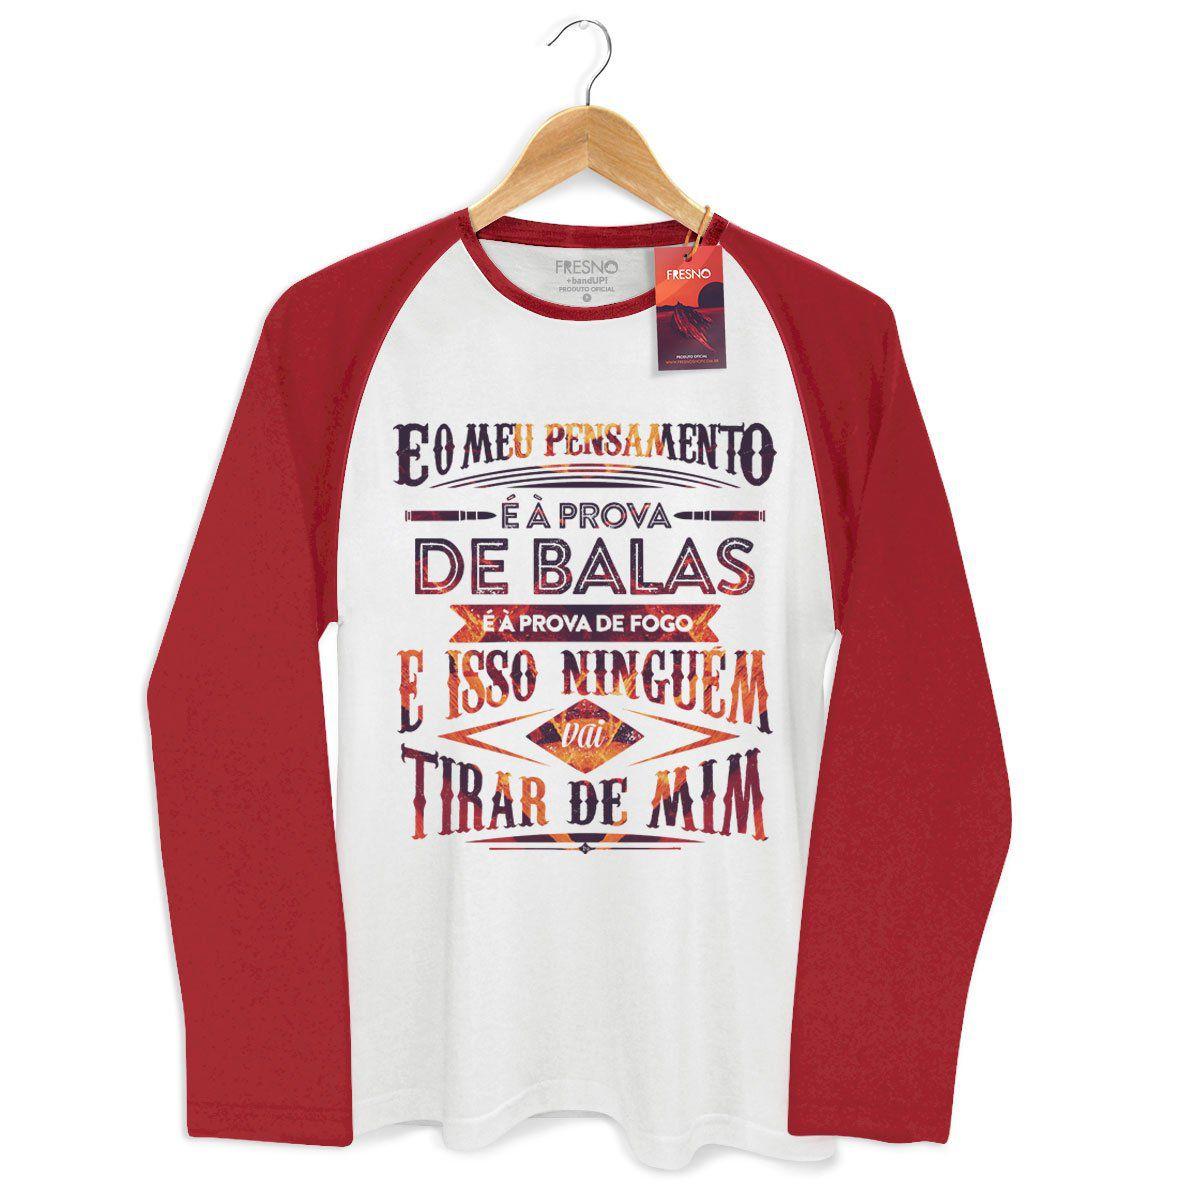 Camiseta Manga Longa Raglan Masculina Fresno Pensamento à Prova de Balas Type 2